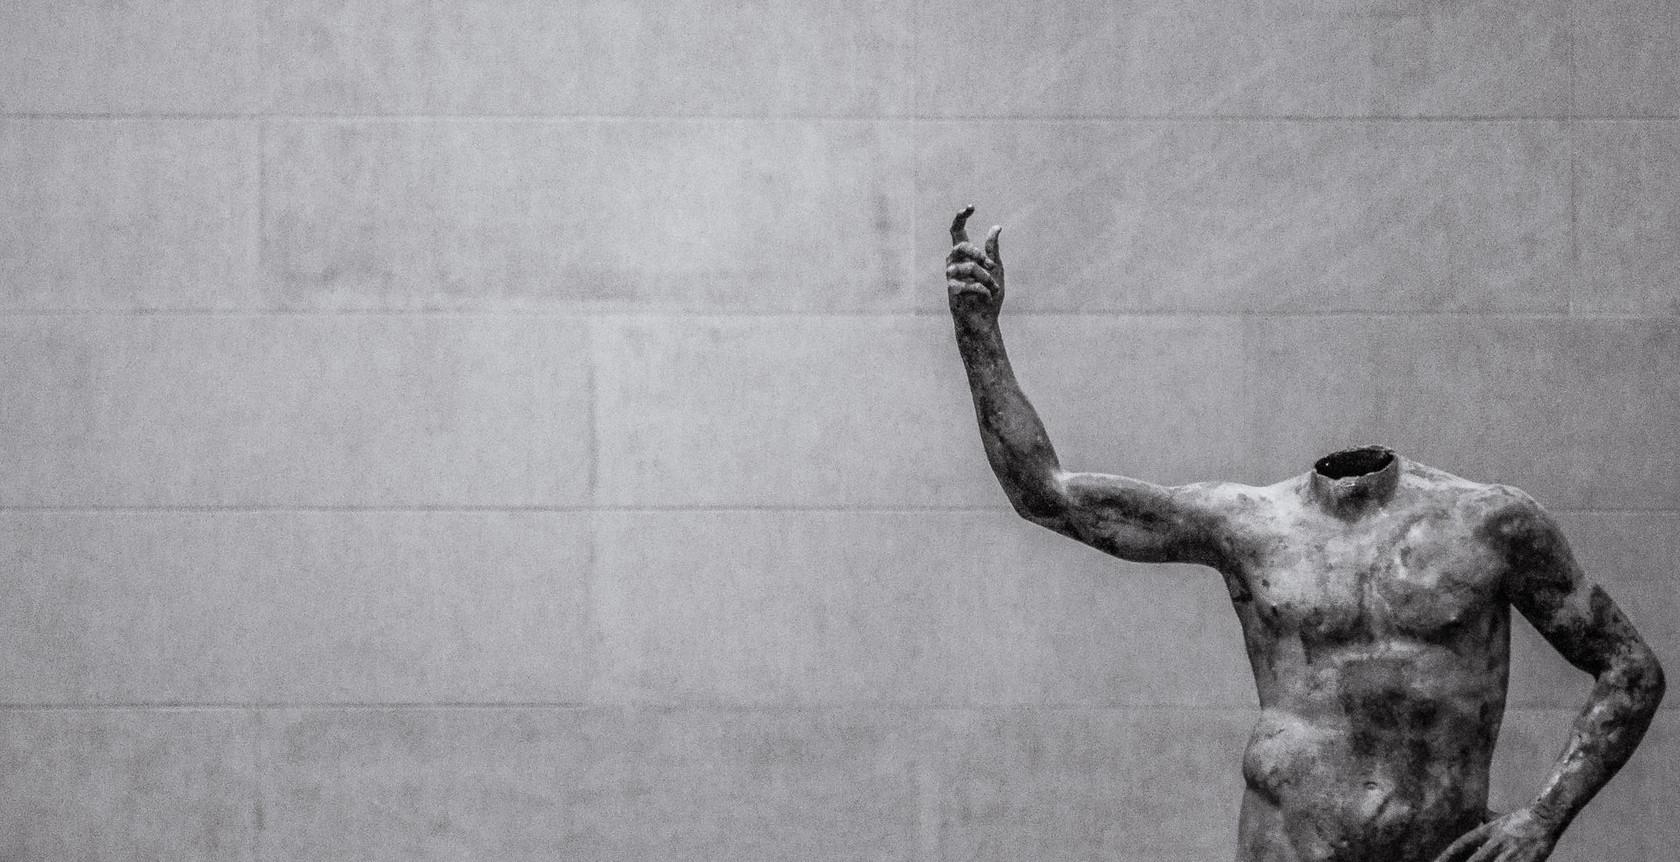 A headless statue